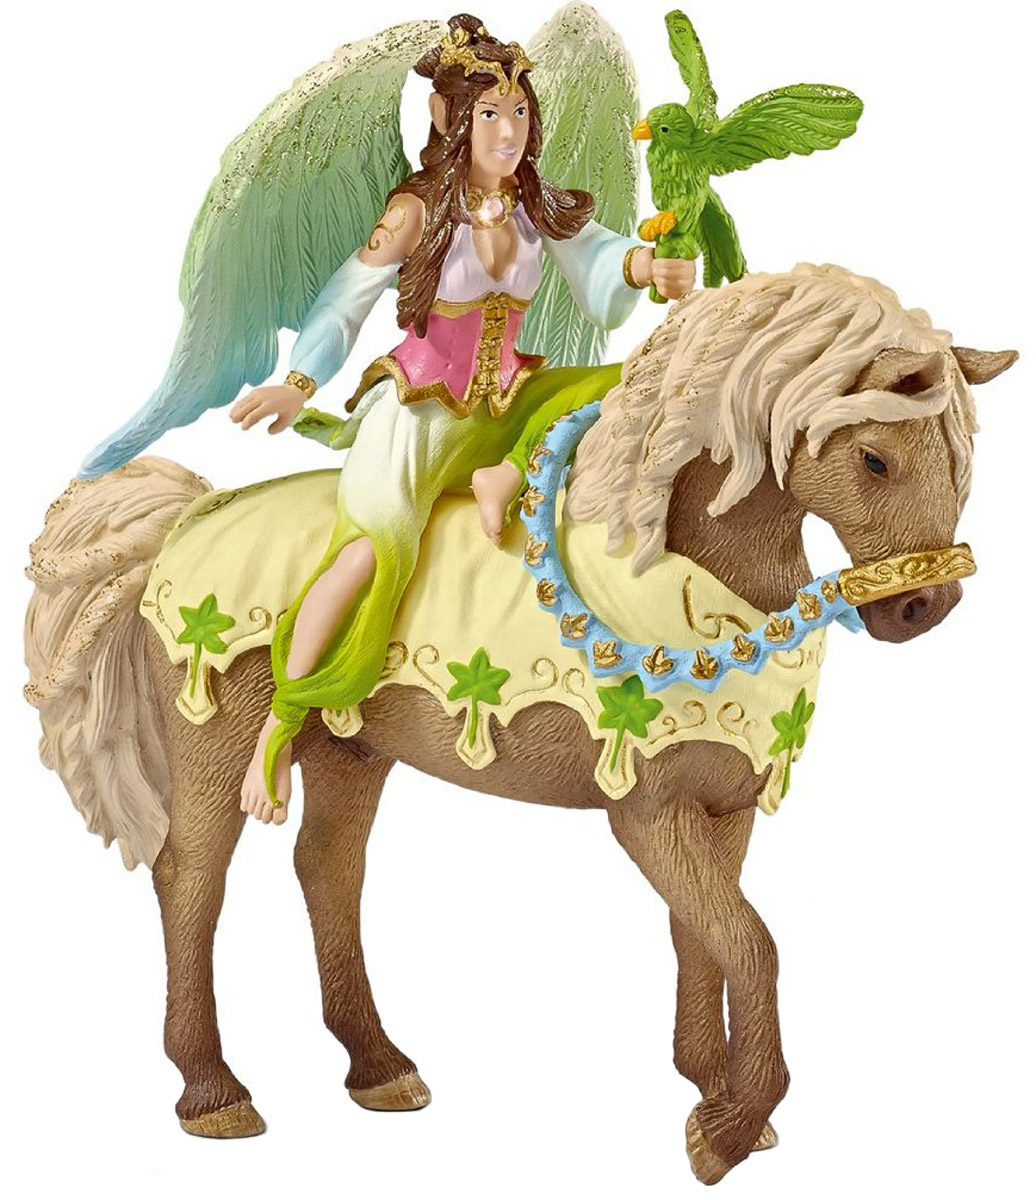 Schleich Фигурка Эльфийка Сурах на лошади игрушка schleich фигурка андалузская кобыла